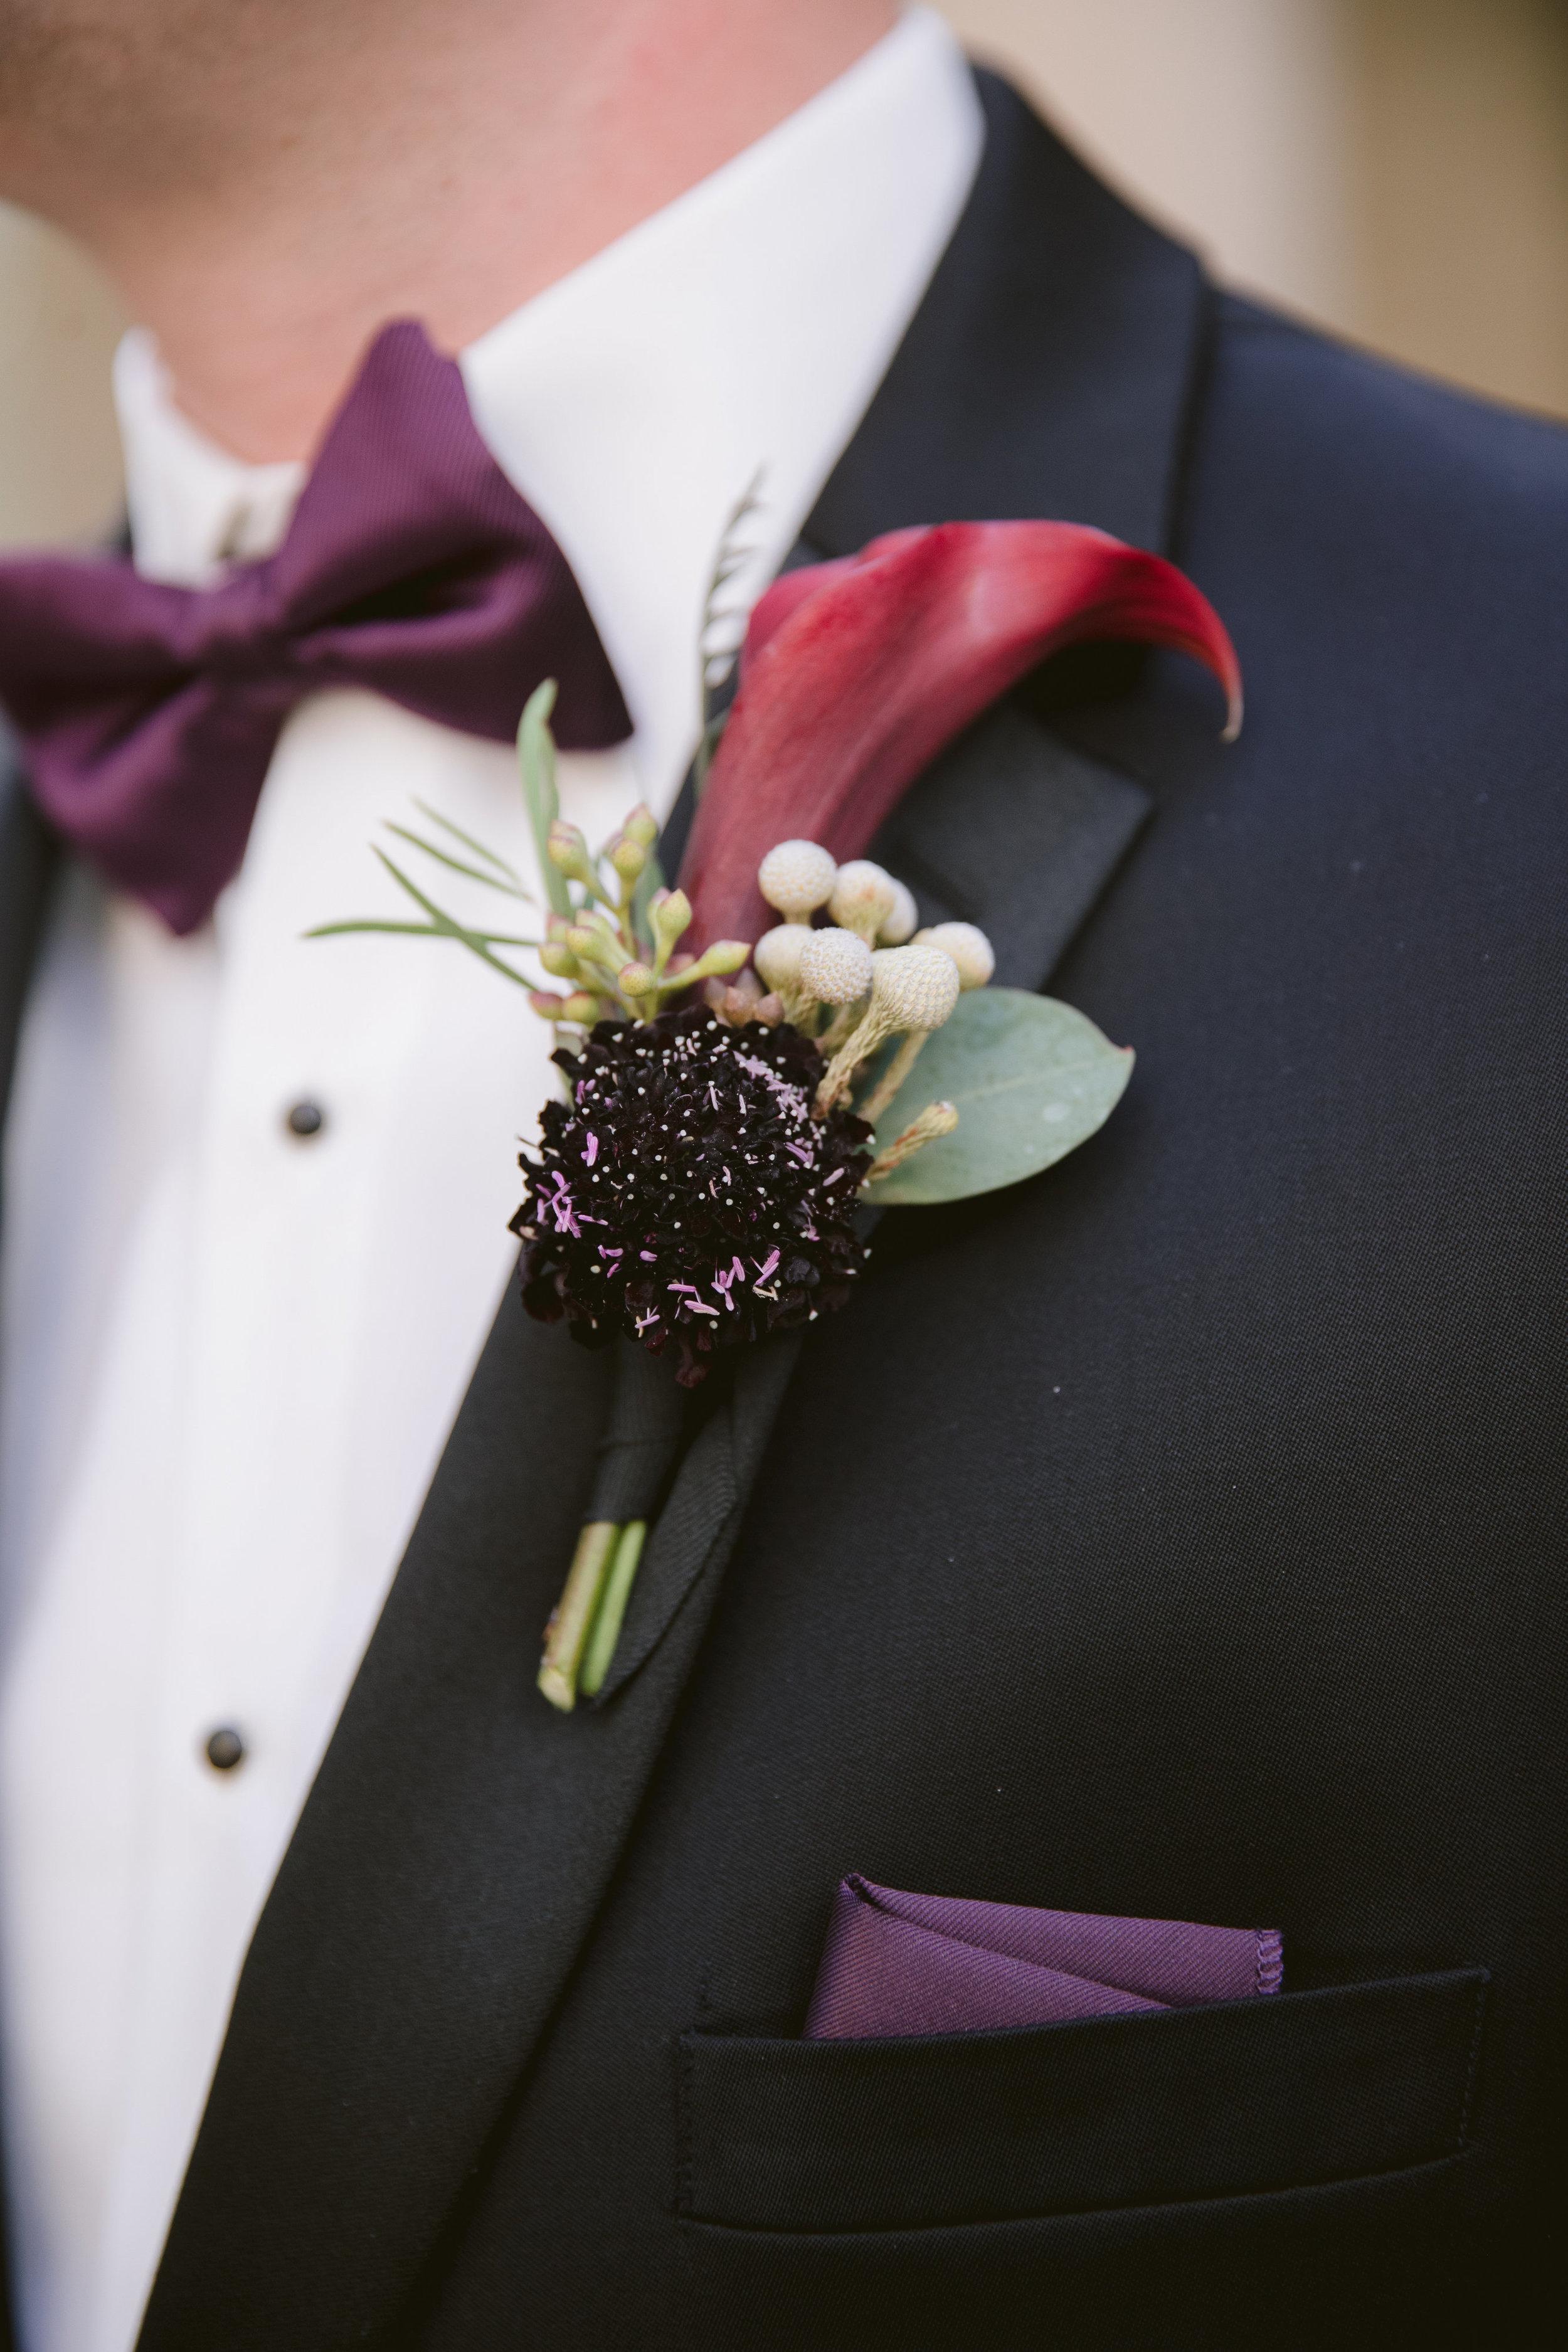 Purple wedding boutonniere. Photo by Laura Stone Photography.